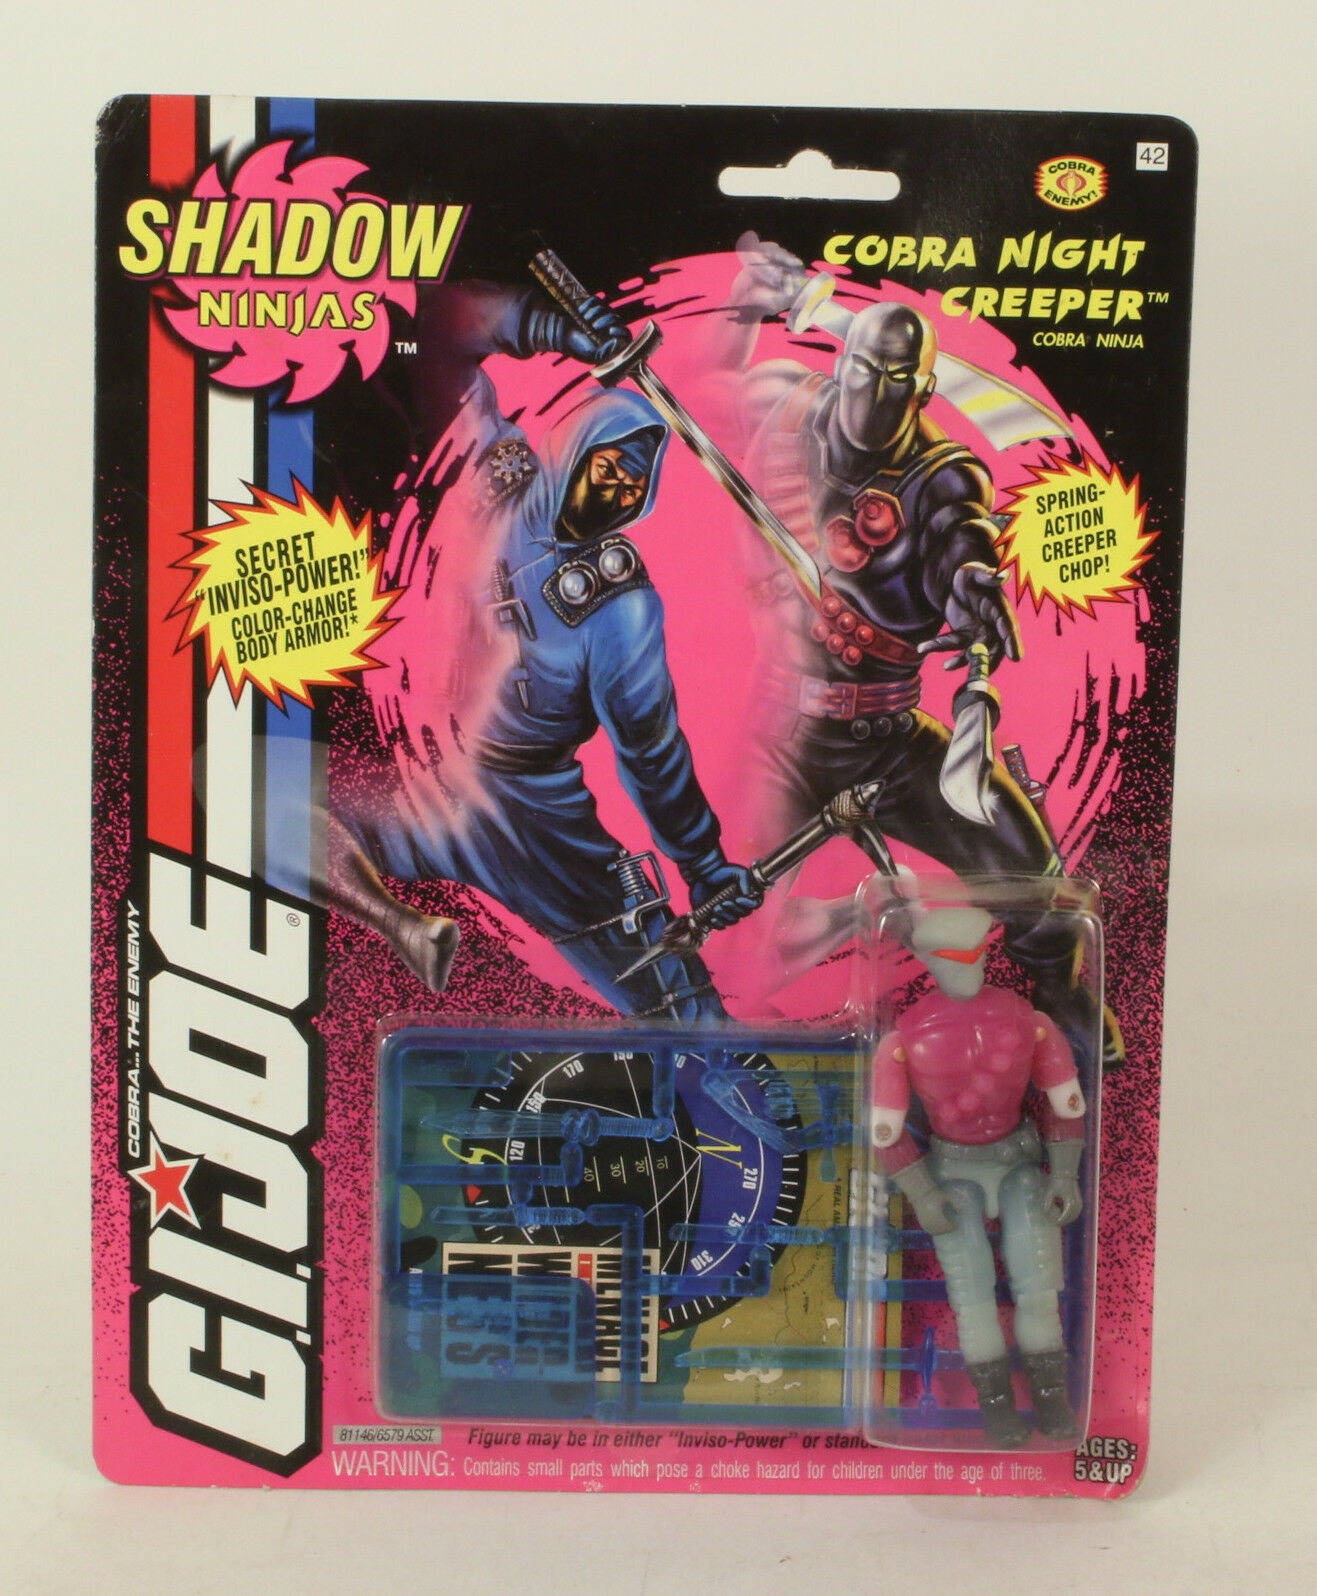 G.I. Joe Shadow Ninjas  Cobra Night Creeper 1993